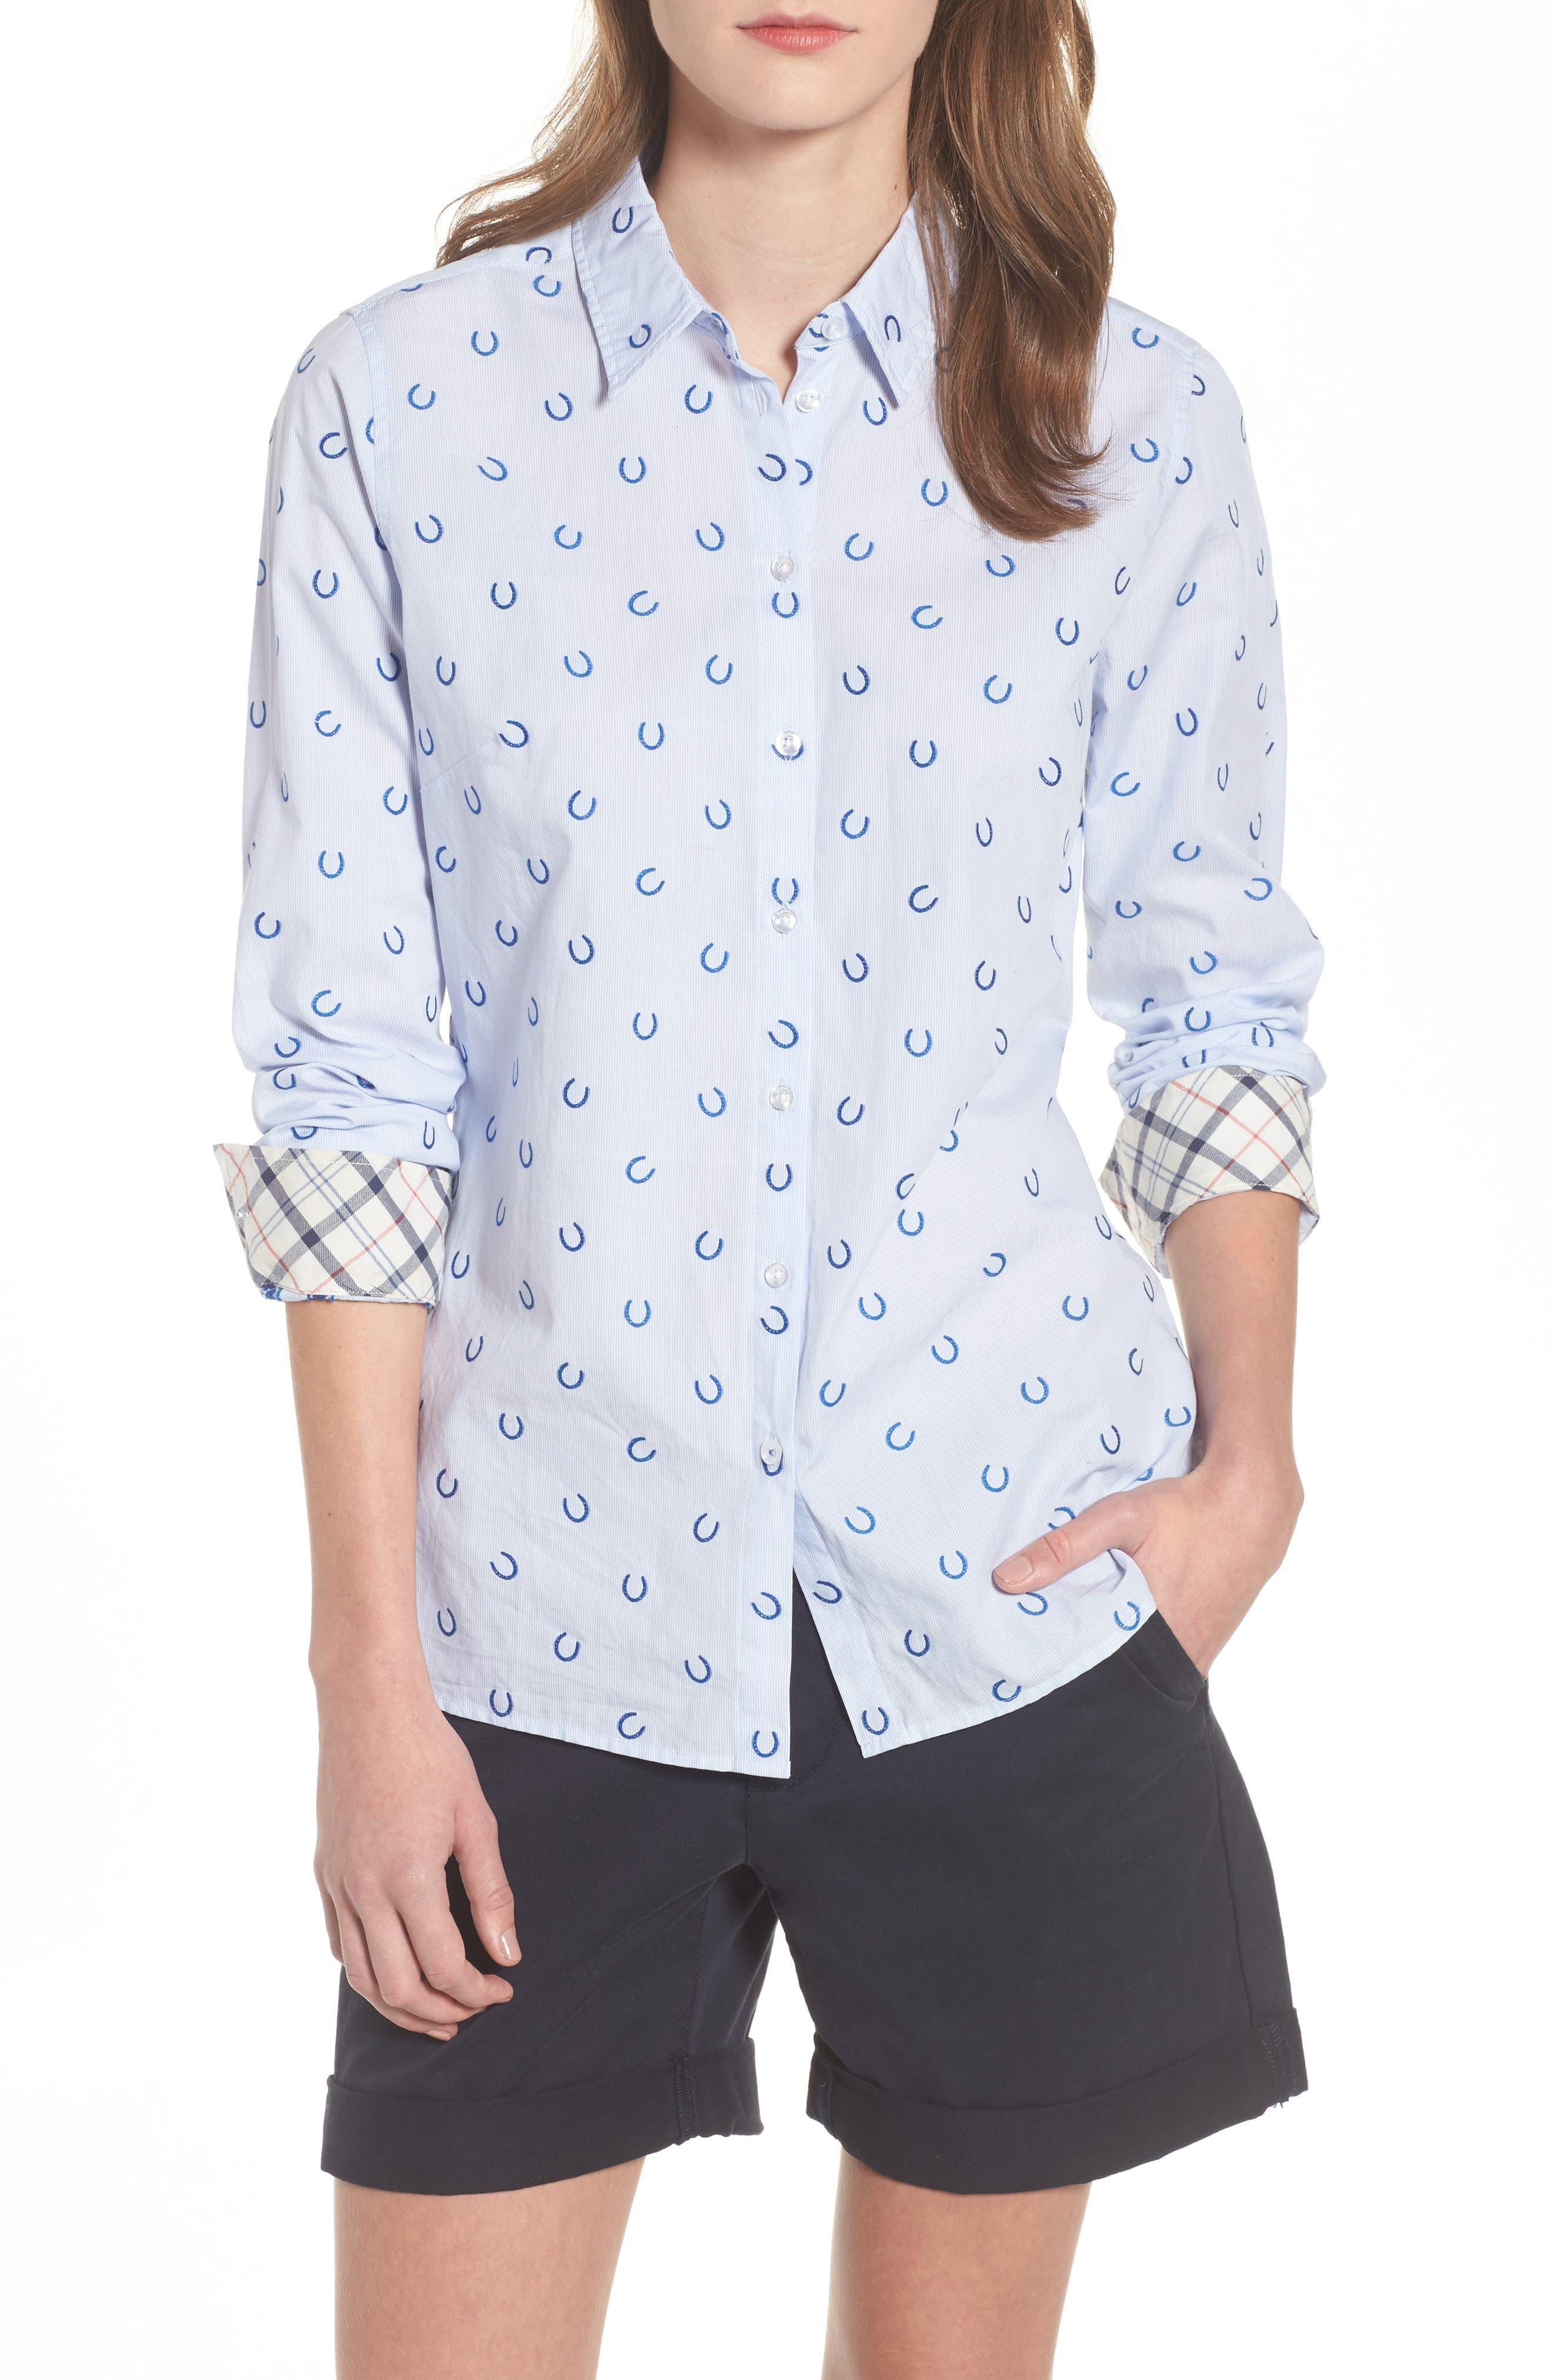 Daisyhill Regular Fit Shirt,                             Main thumbnail 1, color,                             Pale Blue